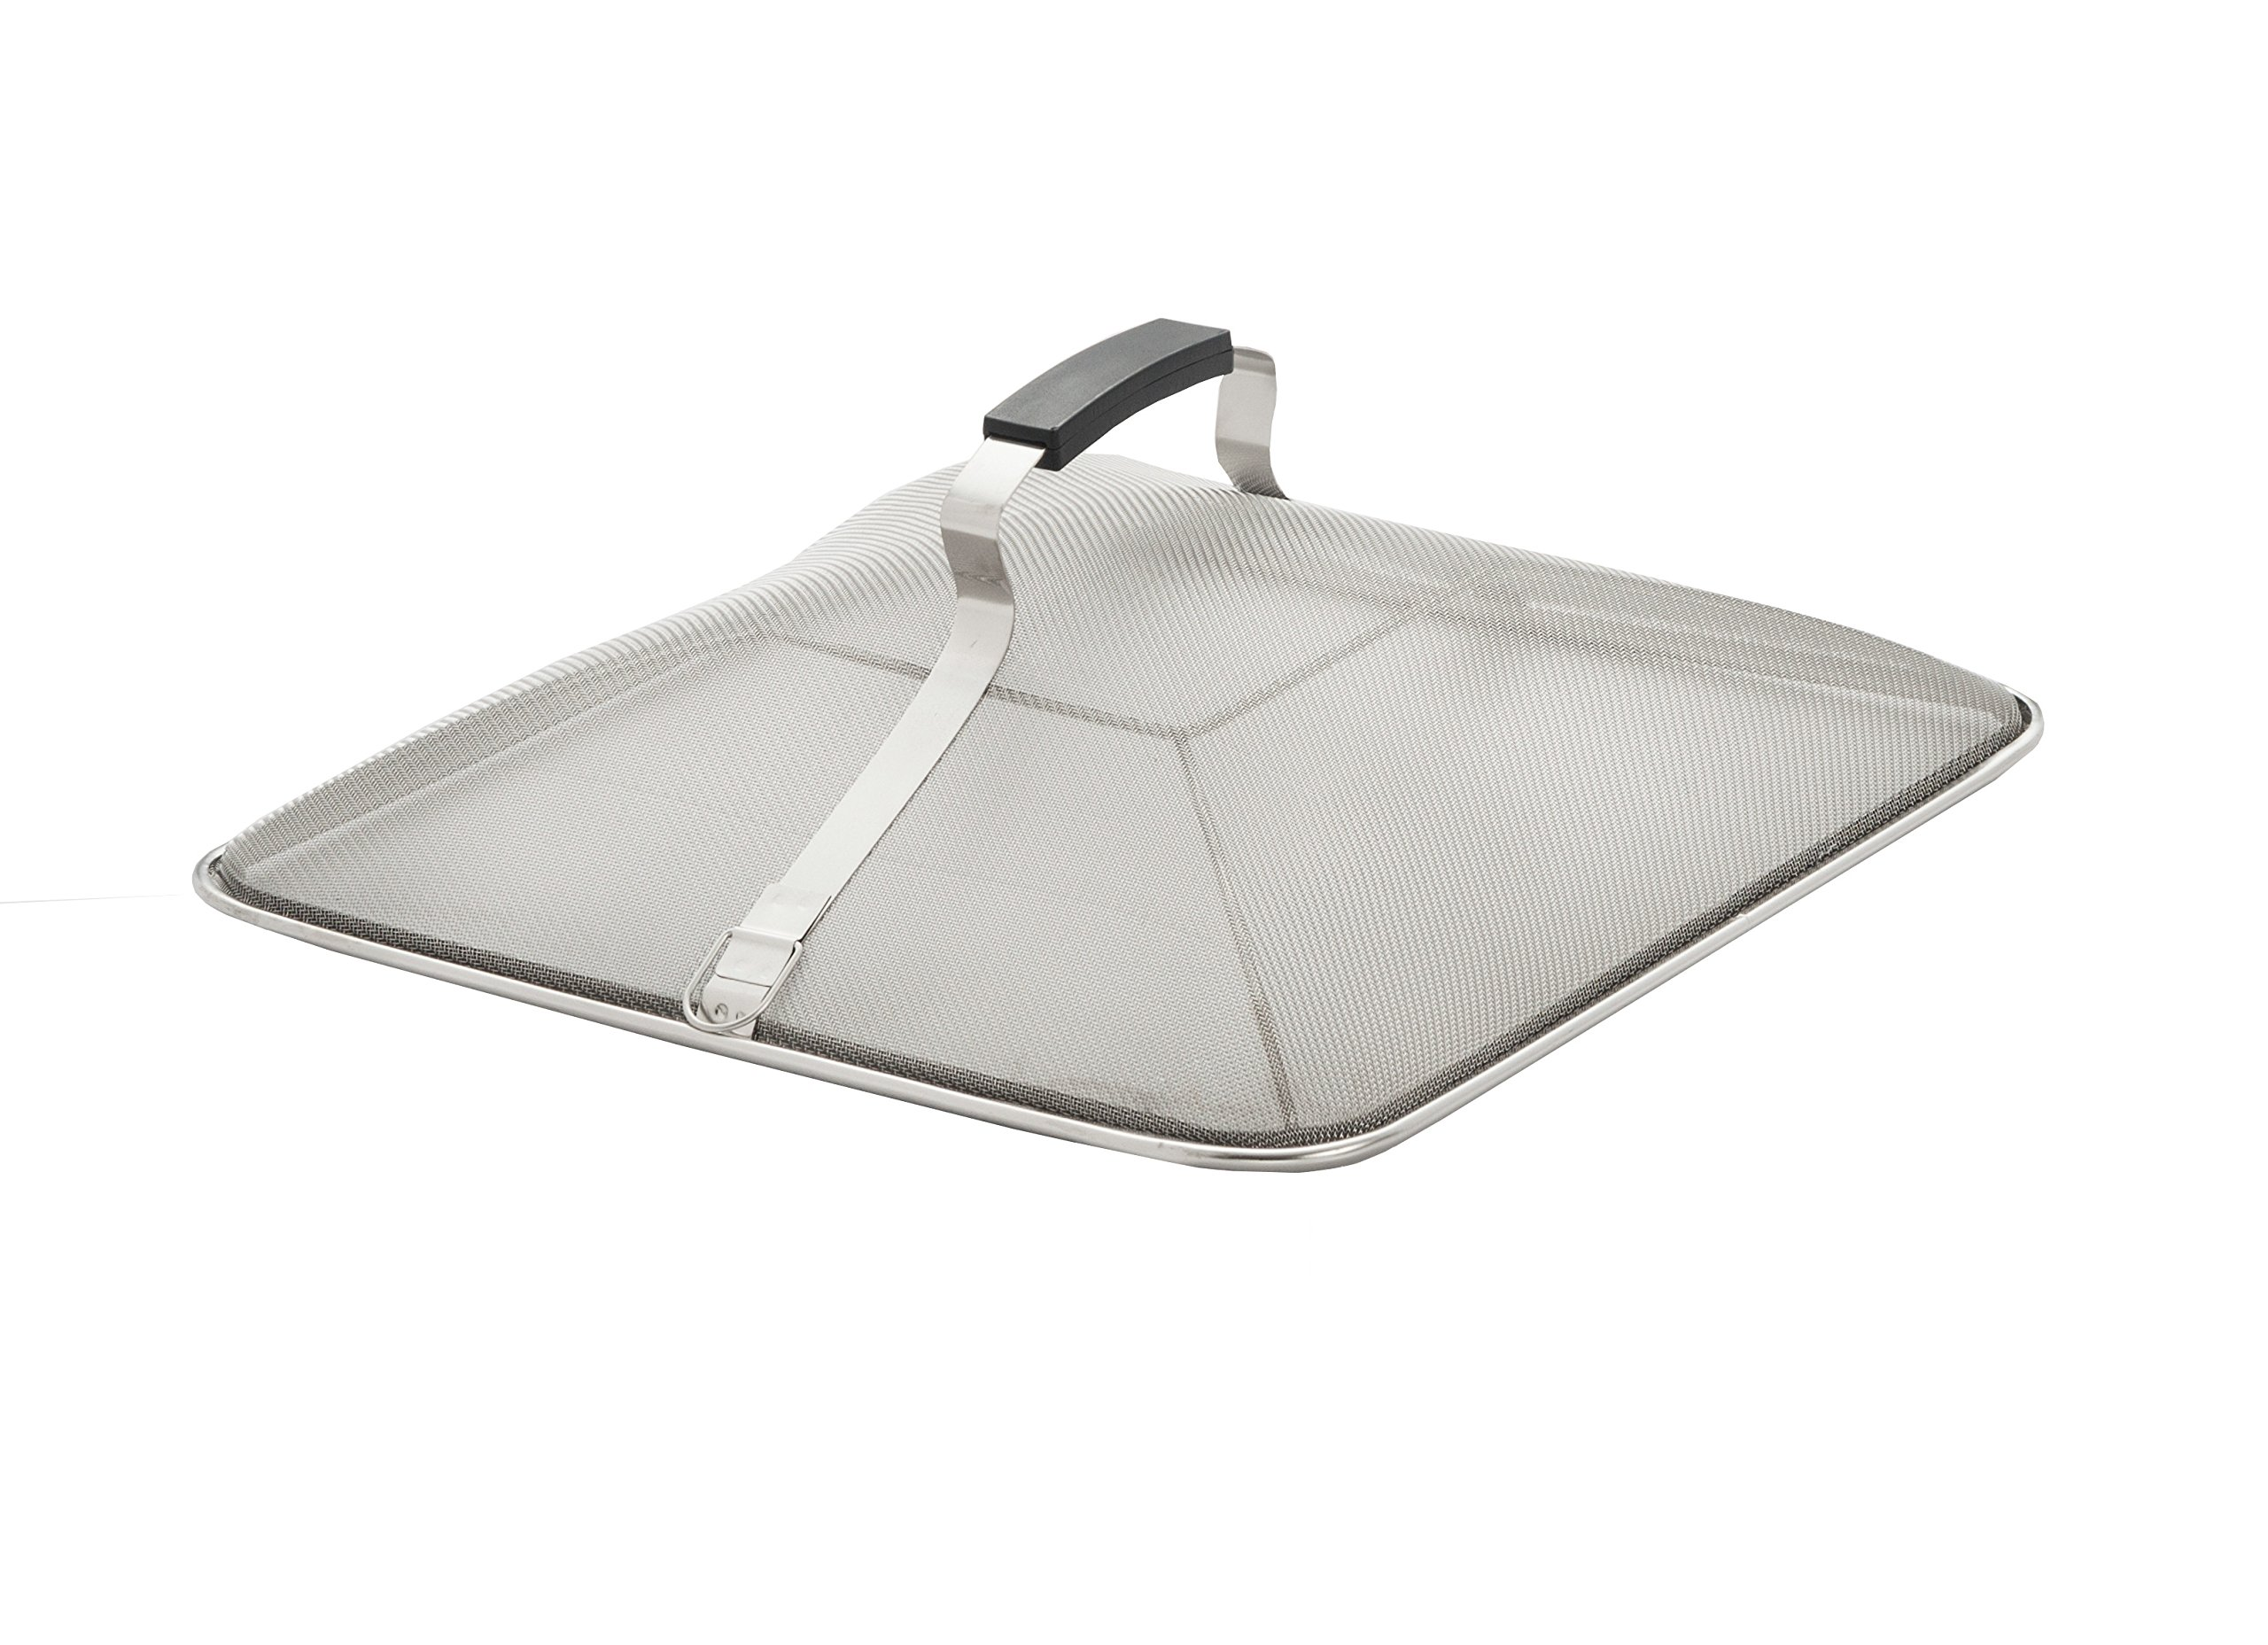 Excelsteel Stainless Steel 12-1/4-Inch Square Splatter Screen